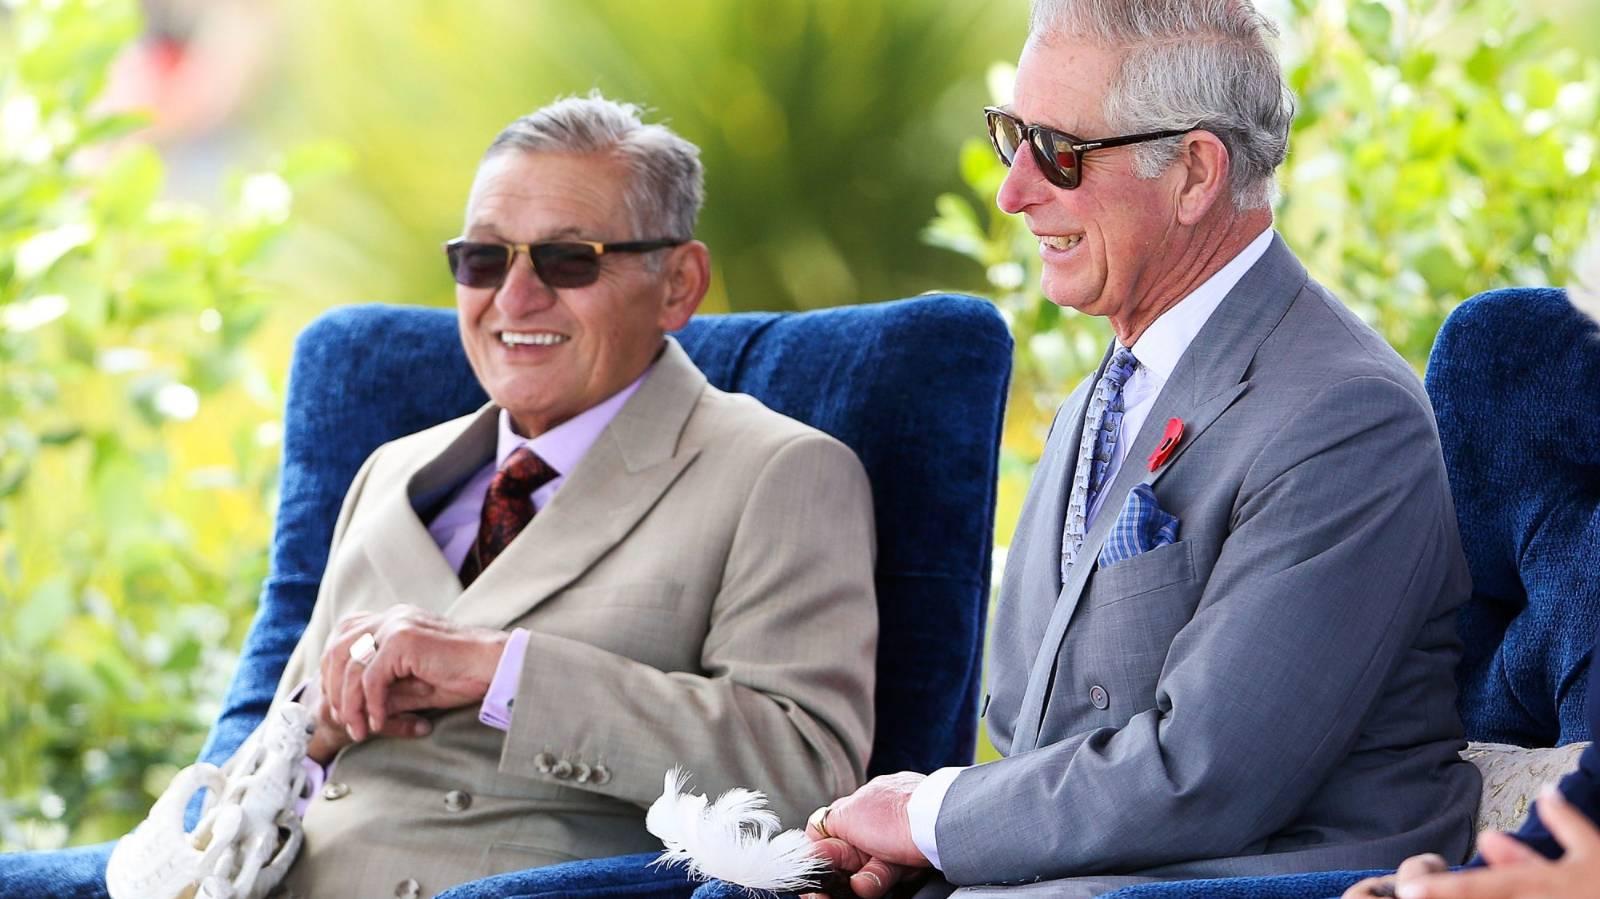 Kiingitanga pays tribute to Prince Philip